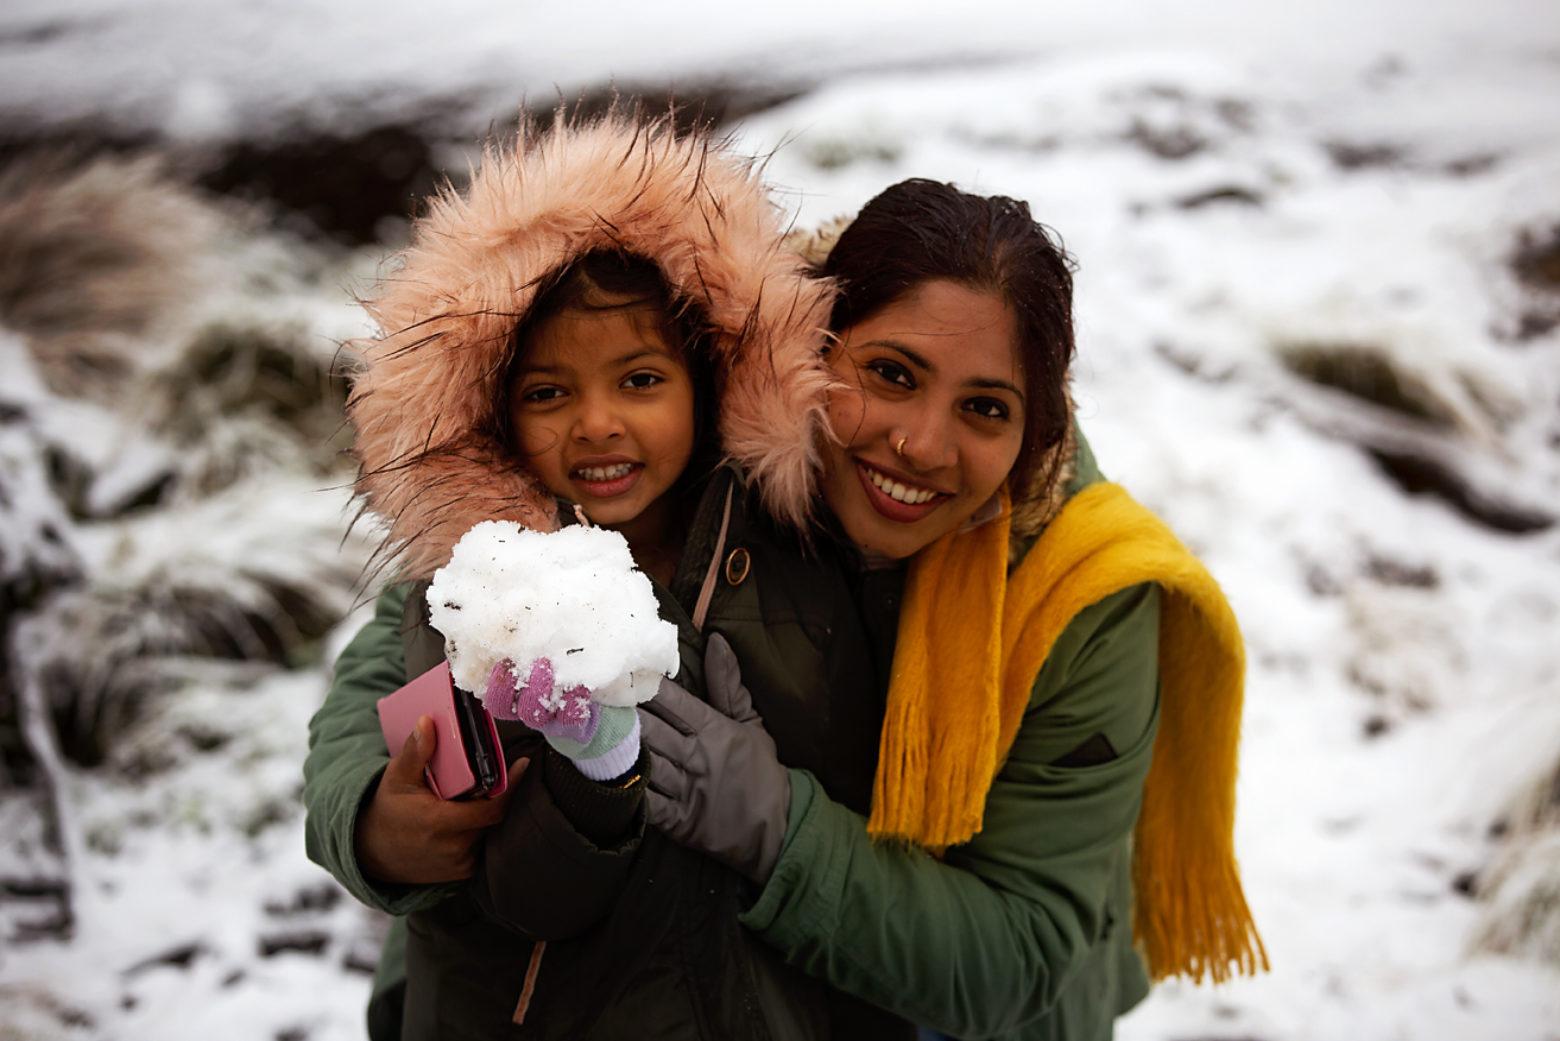 Shri Adigopula Barrington Tops Snow 23 6 2020 purchased non exclusive 2